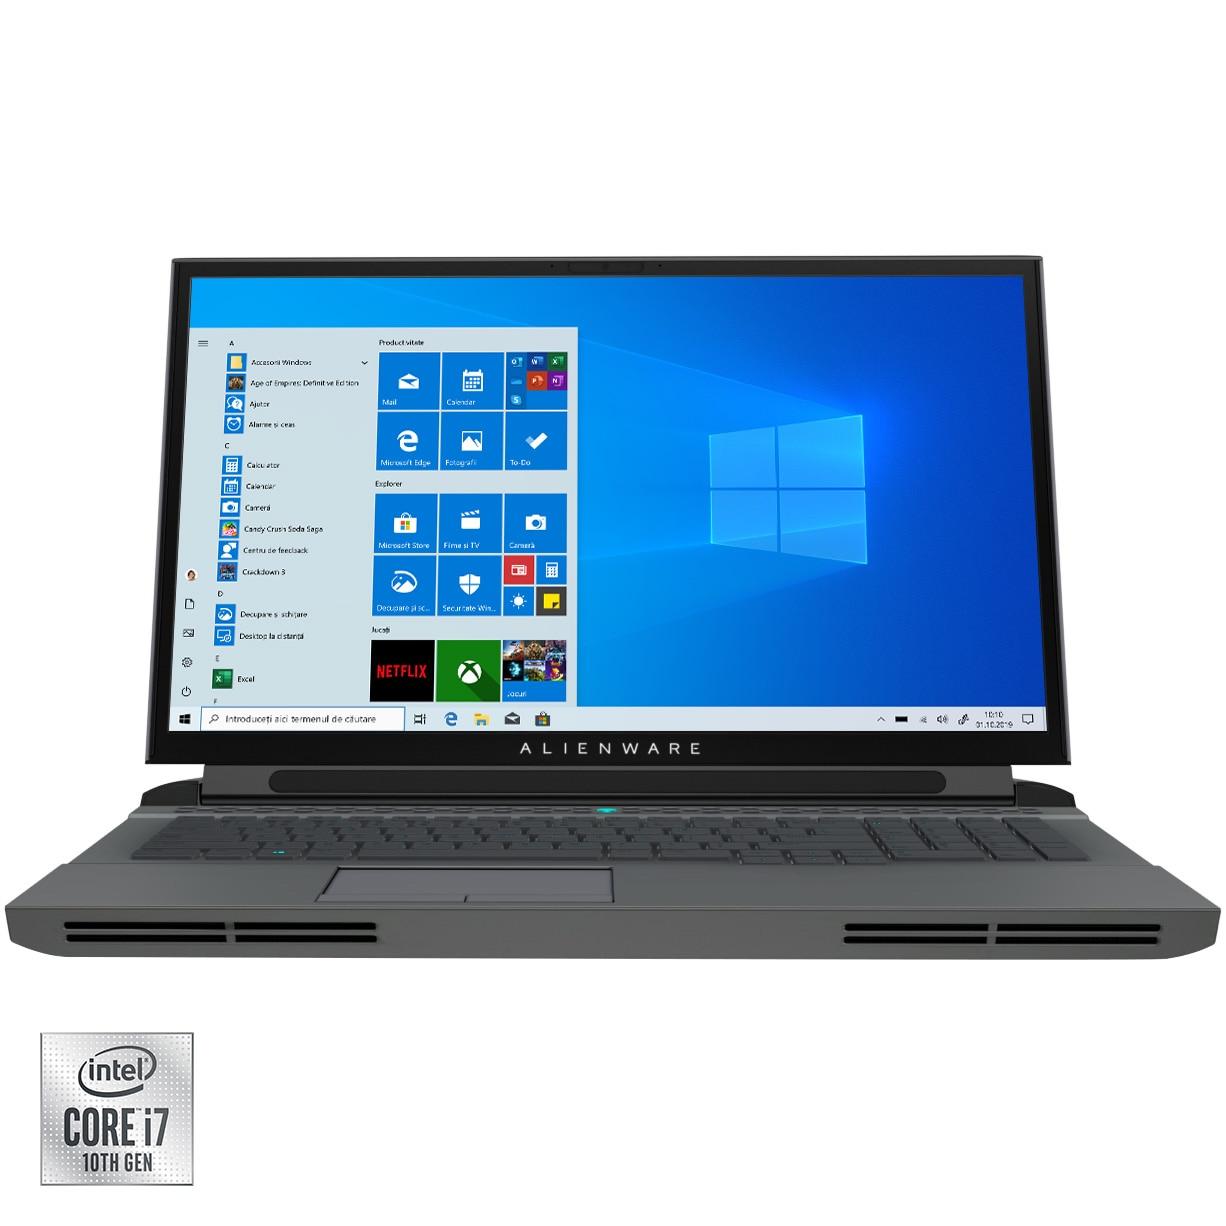 "Fotografie Laptop Gaming Alienware Area 51M R2 cu procesor Intel Core i7-10700K pana la 5.10 GHz, 17.3"", Full HD, 300Hz, 32GB, 1TB SSD, NVIDIA GeForce RTX 2080 SUPER 8GB, Windows 10 Pro, Dark Side of the Moon"